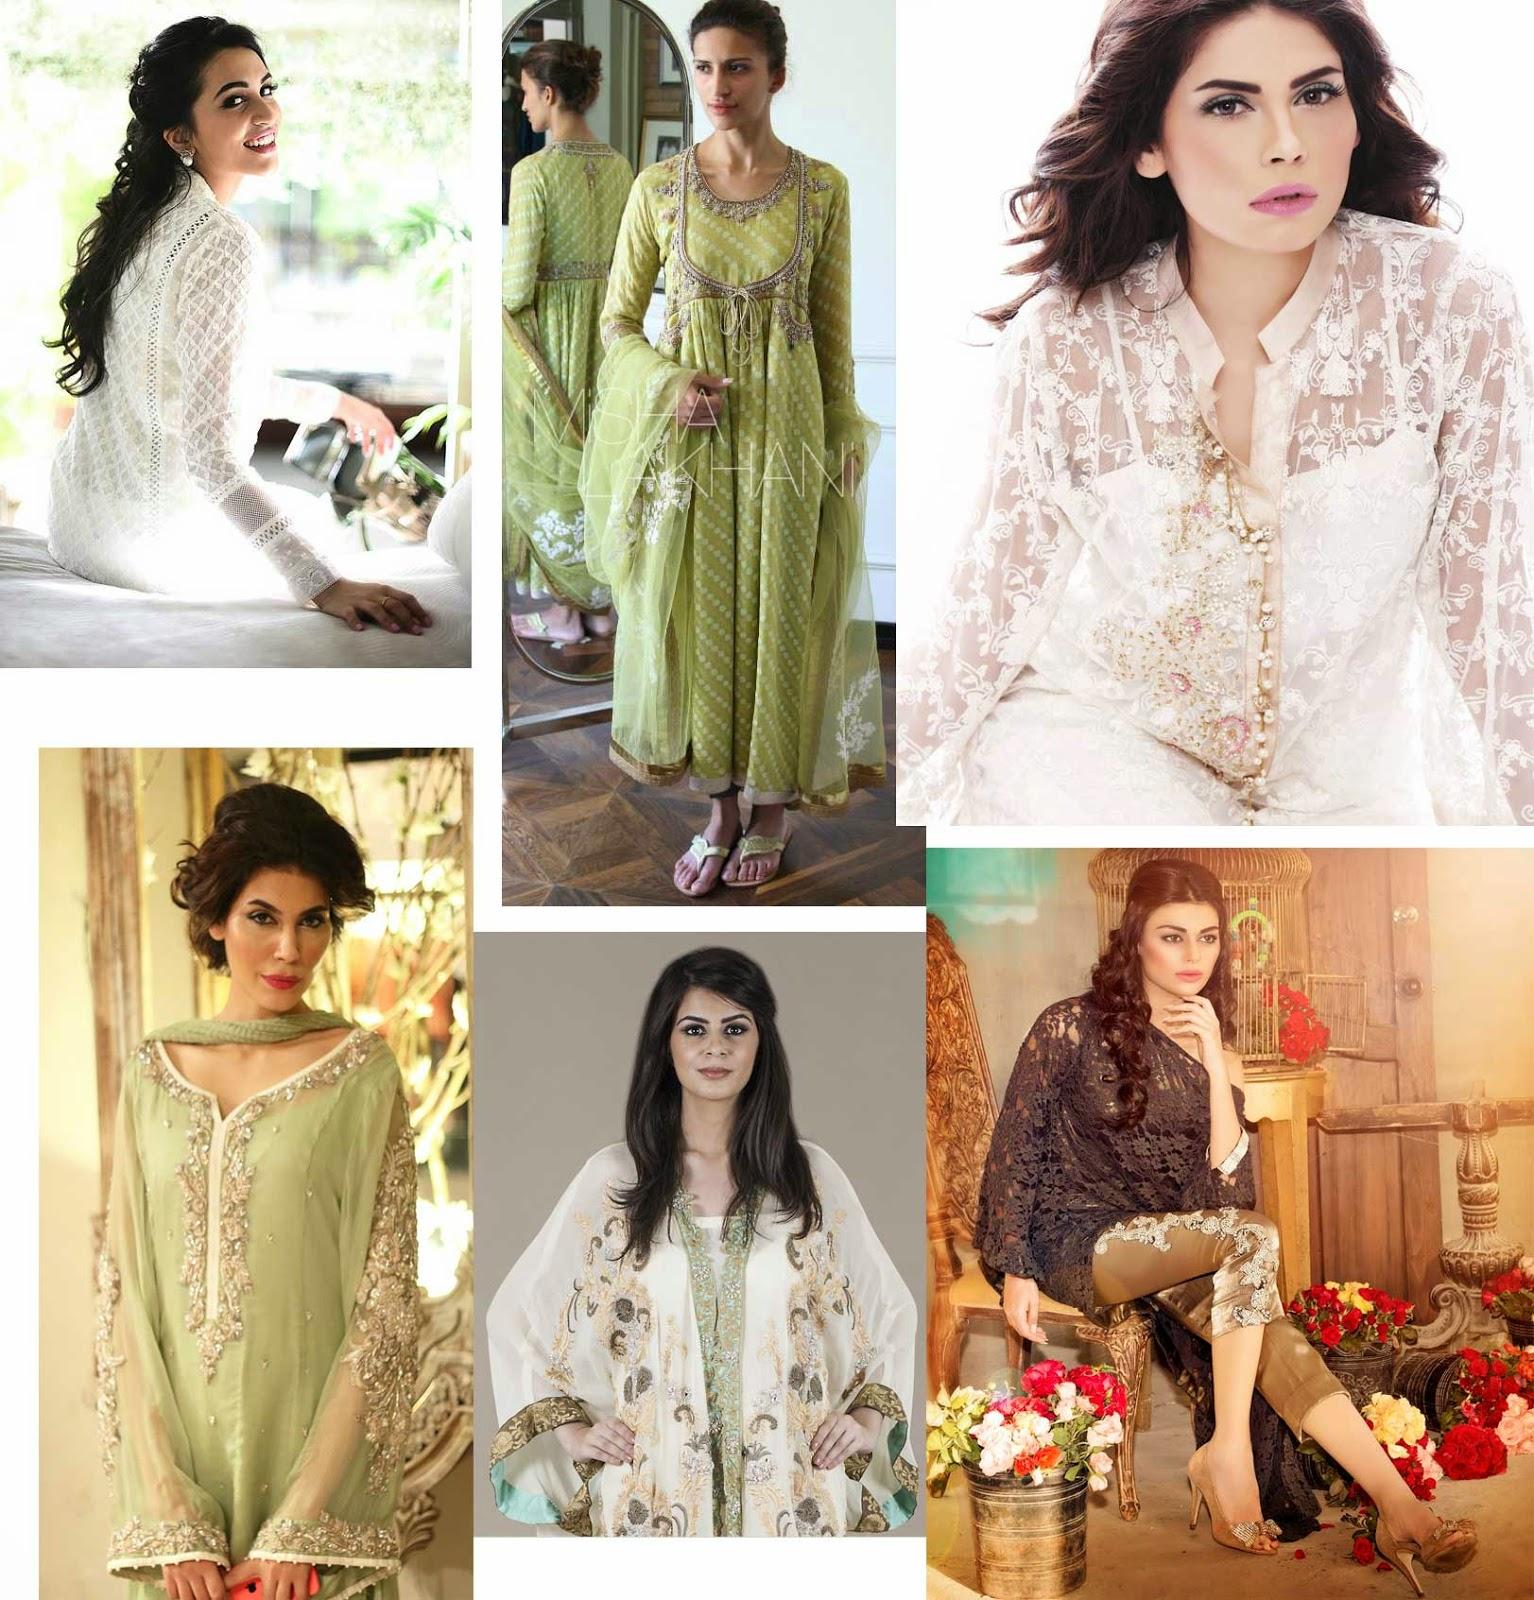 Pretty outfits from  Farah Talib Aziz, Misha Lakhani, Zara Shahjahan, Ayesha Somaya, Ayesha Farook Hashwani and Fahad Hussayn